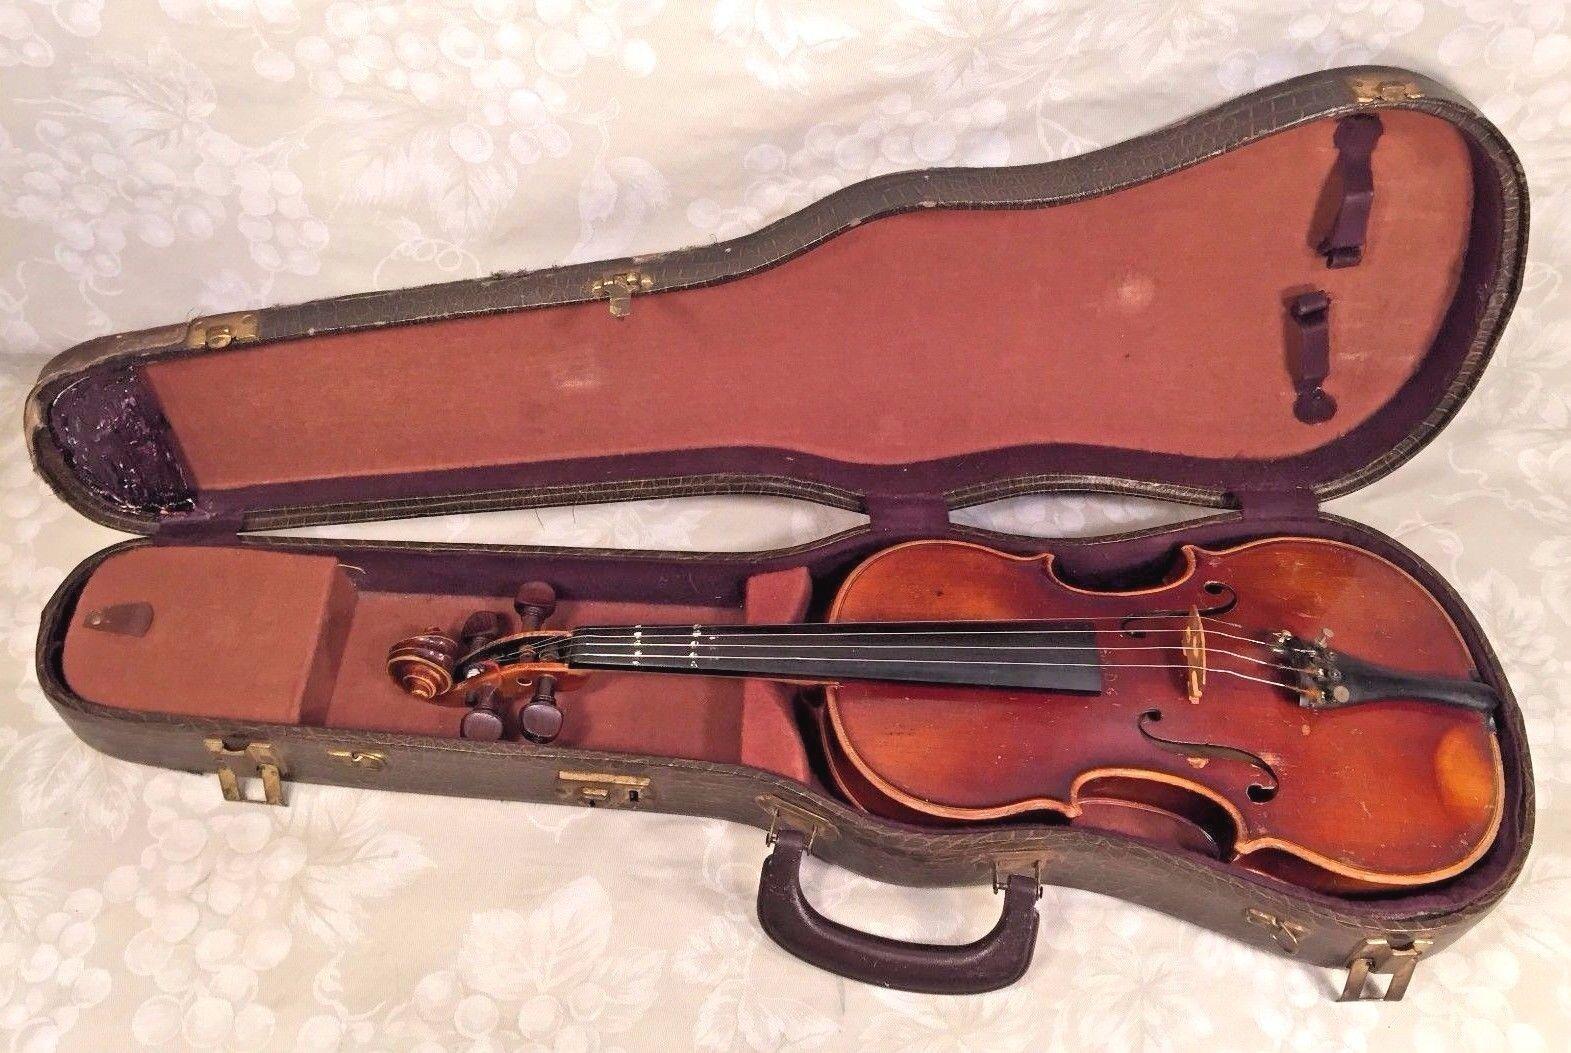 Vintage e r pfretzschner violín con estuche estuche estuche duro 1975 Modelo Antonius Stradivarius cc00f0